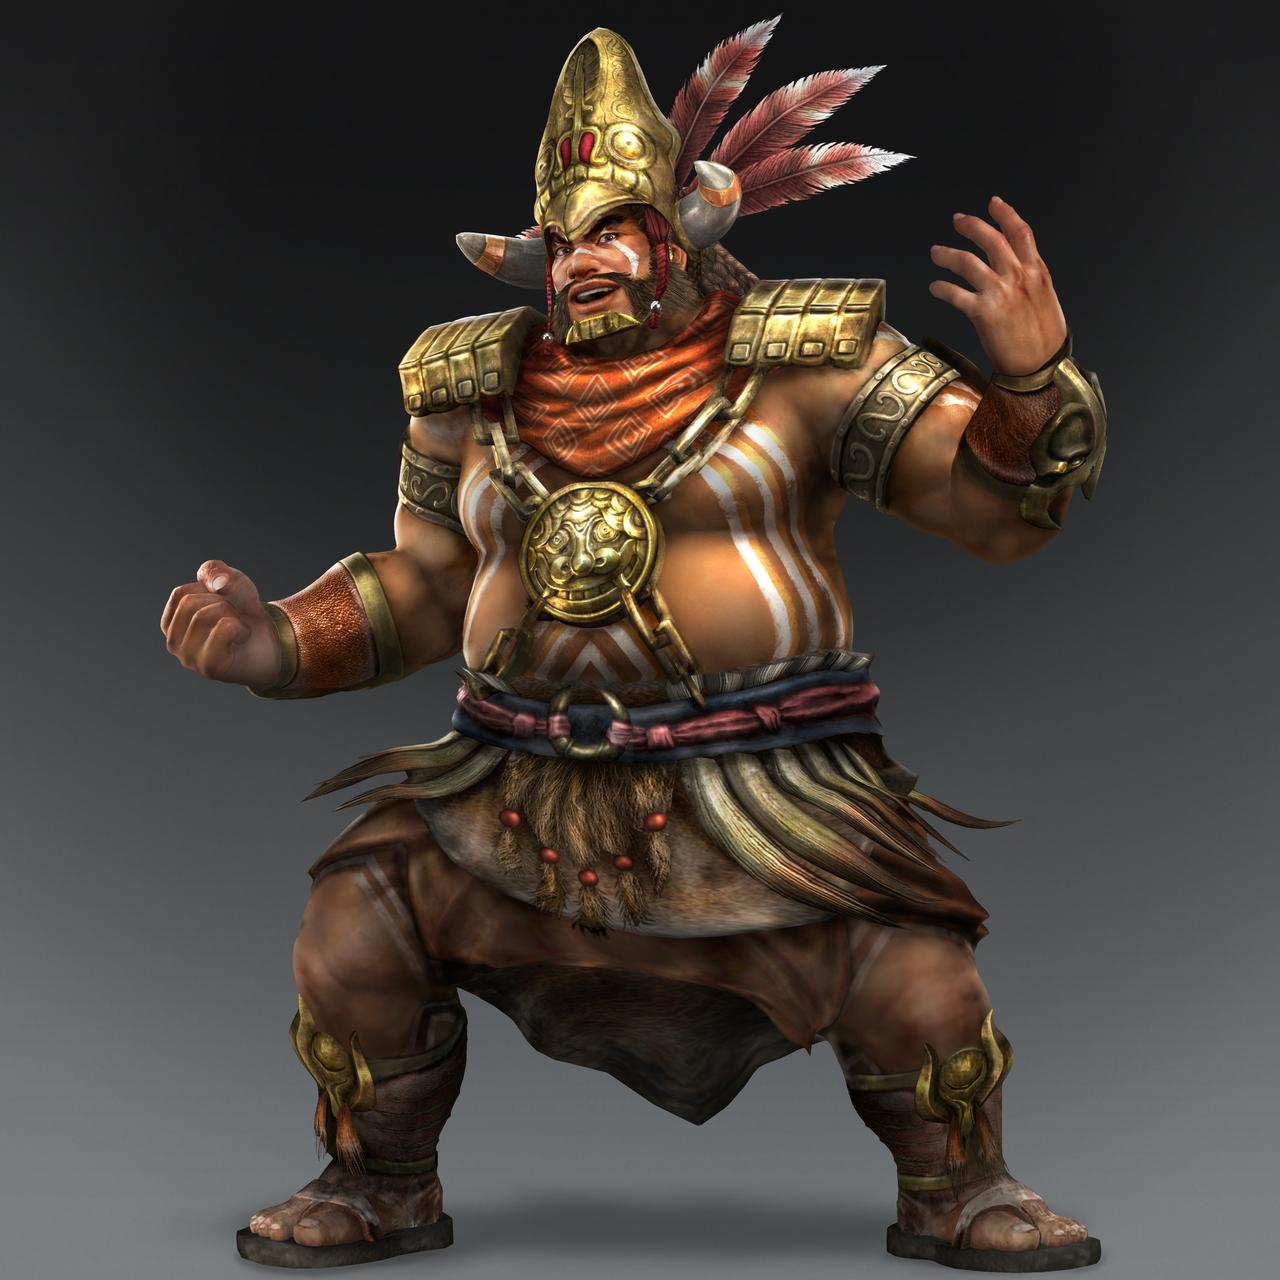 Warriors Orochi 3 Ultimate Wang Yi: Dynasty Warriors 8 Announced!